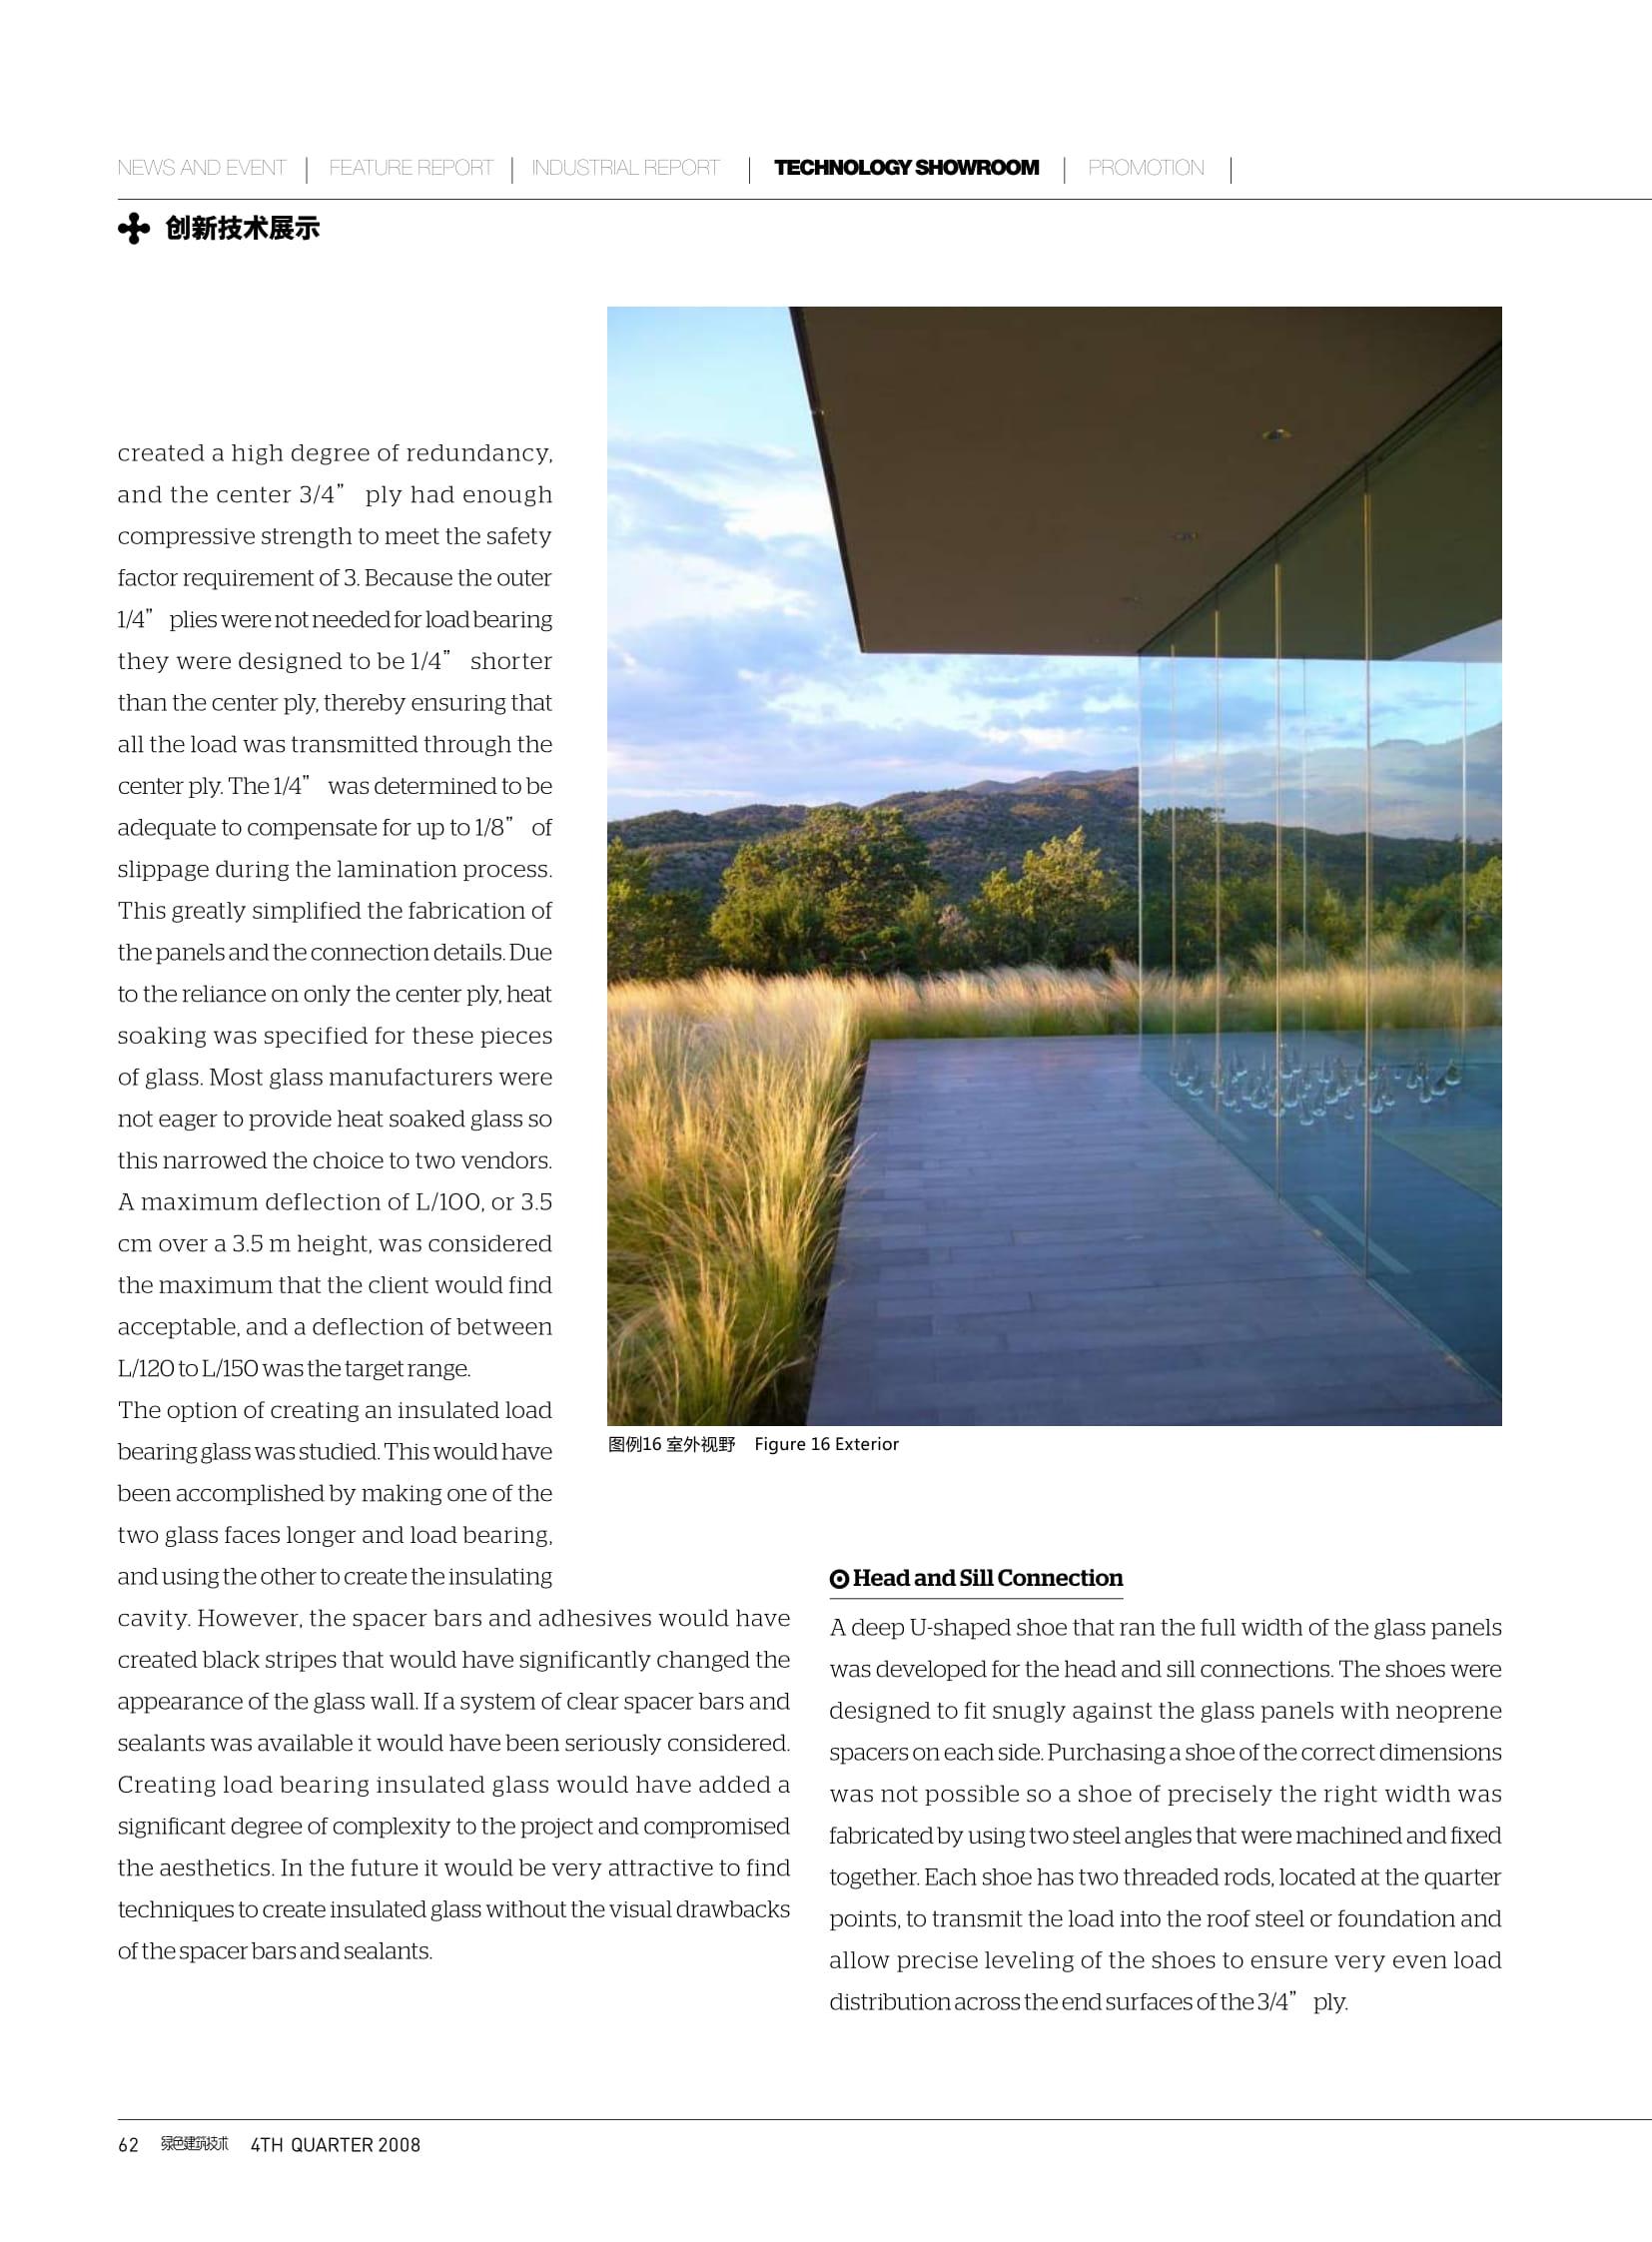 DuBois+Santa+Fe+IGA+Glass+Bearing+Wall-11.jpg